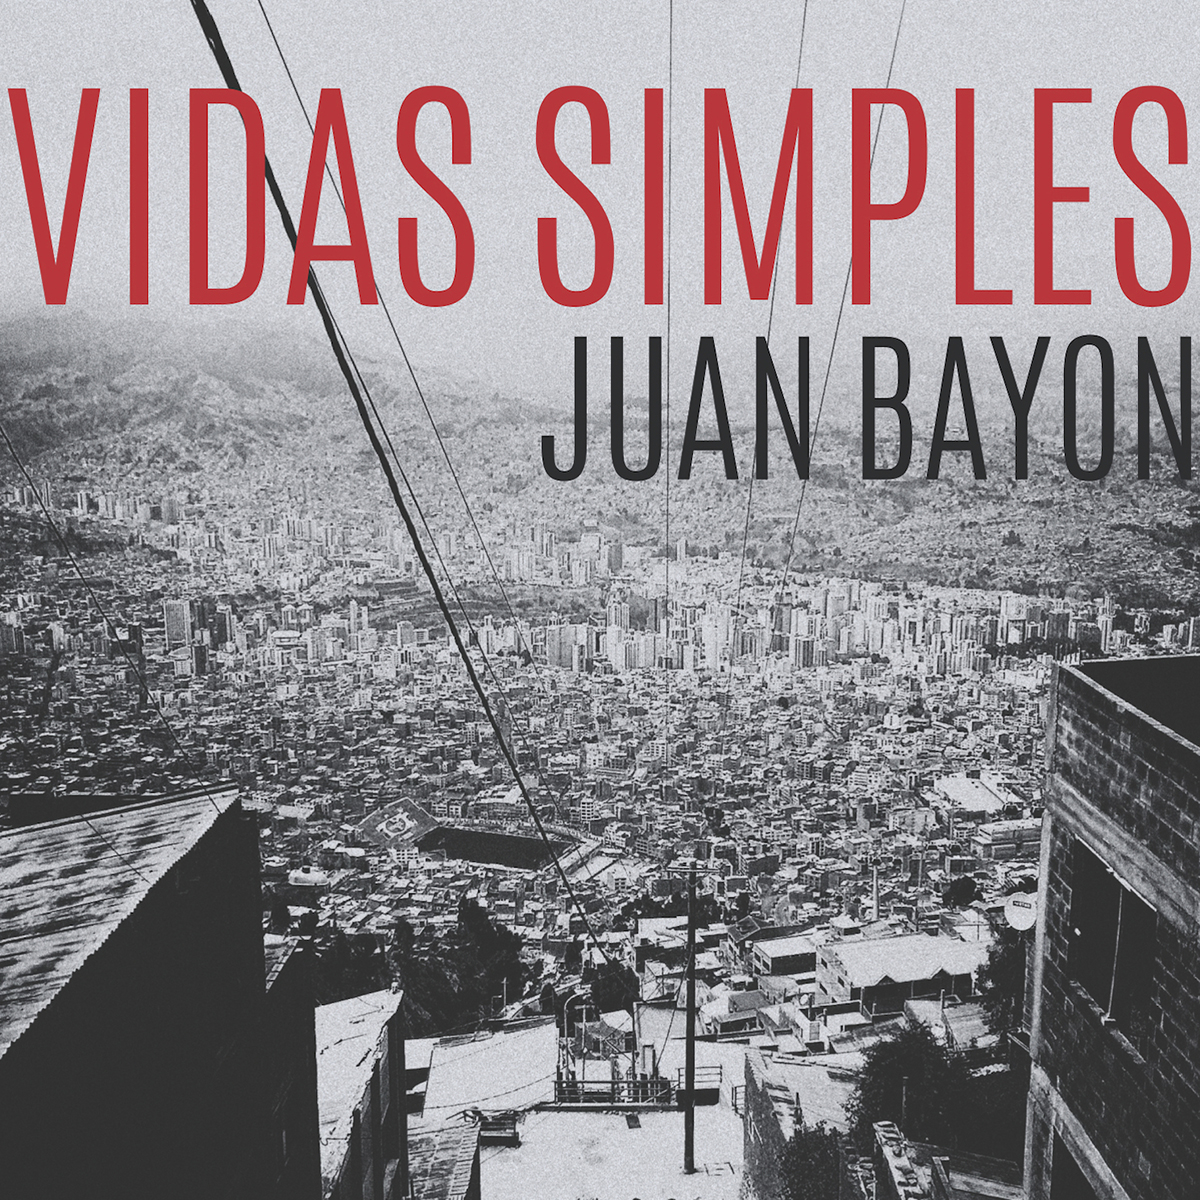 Vidas_Simples_Juan_Bayon_COVERsm.jpg